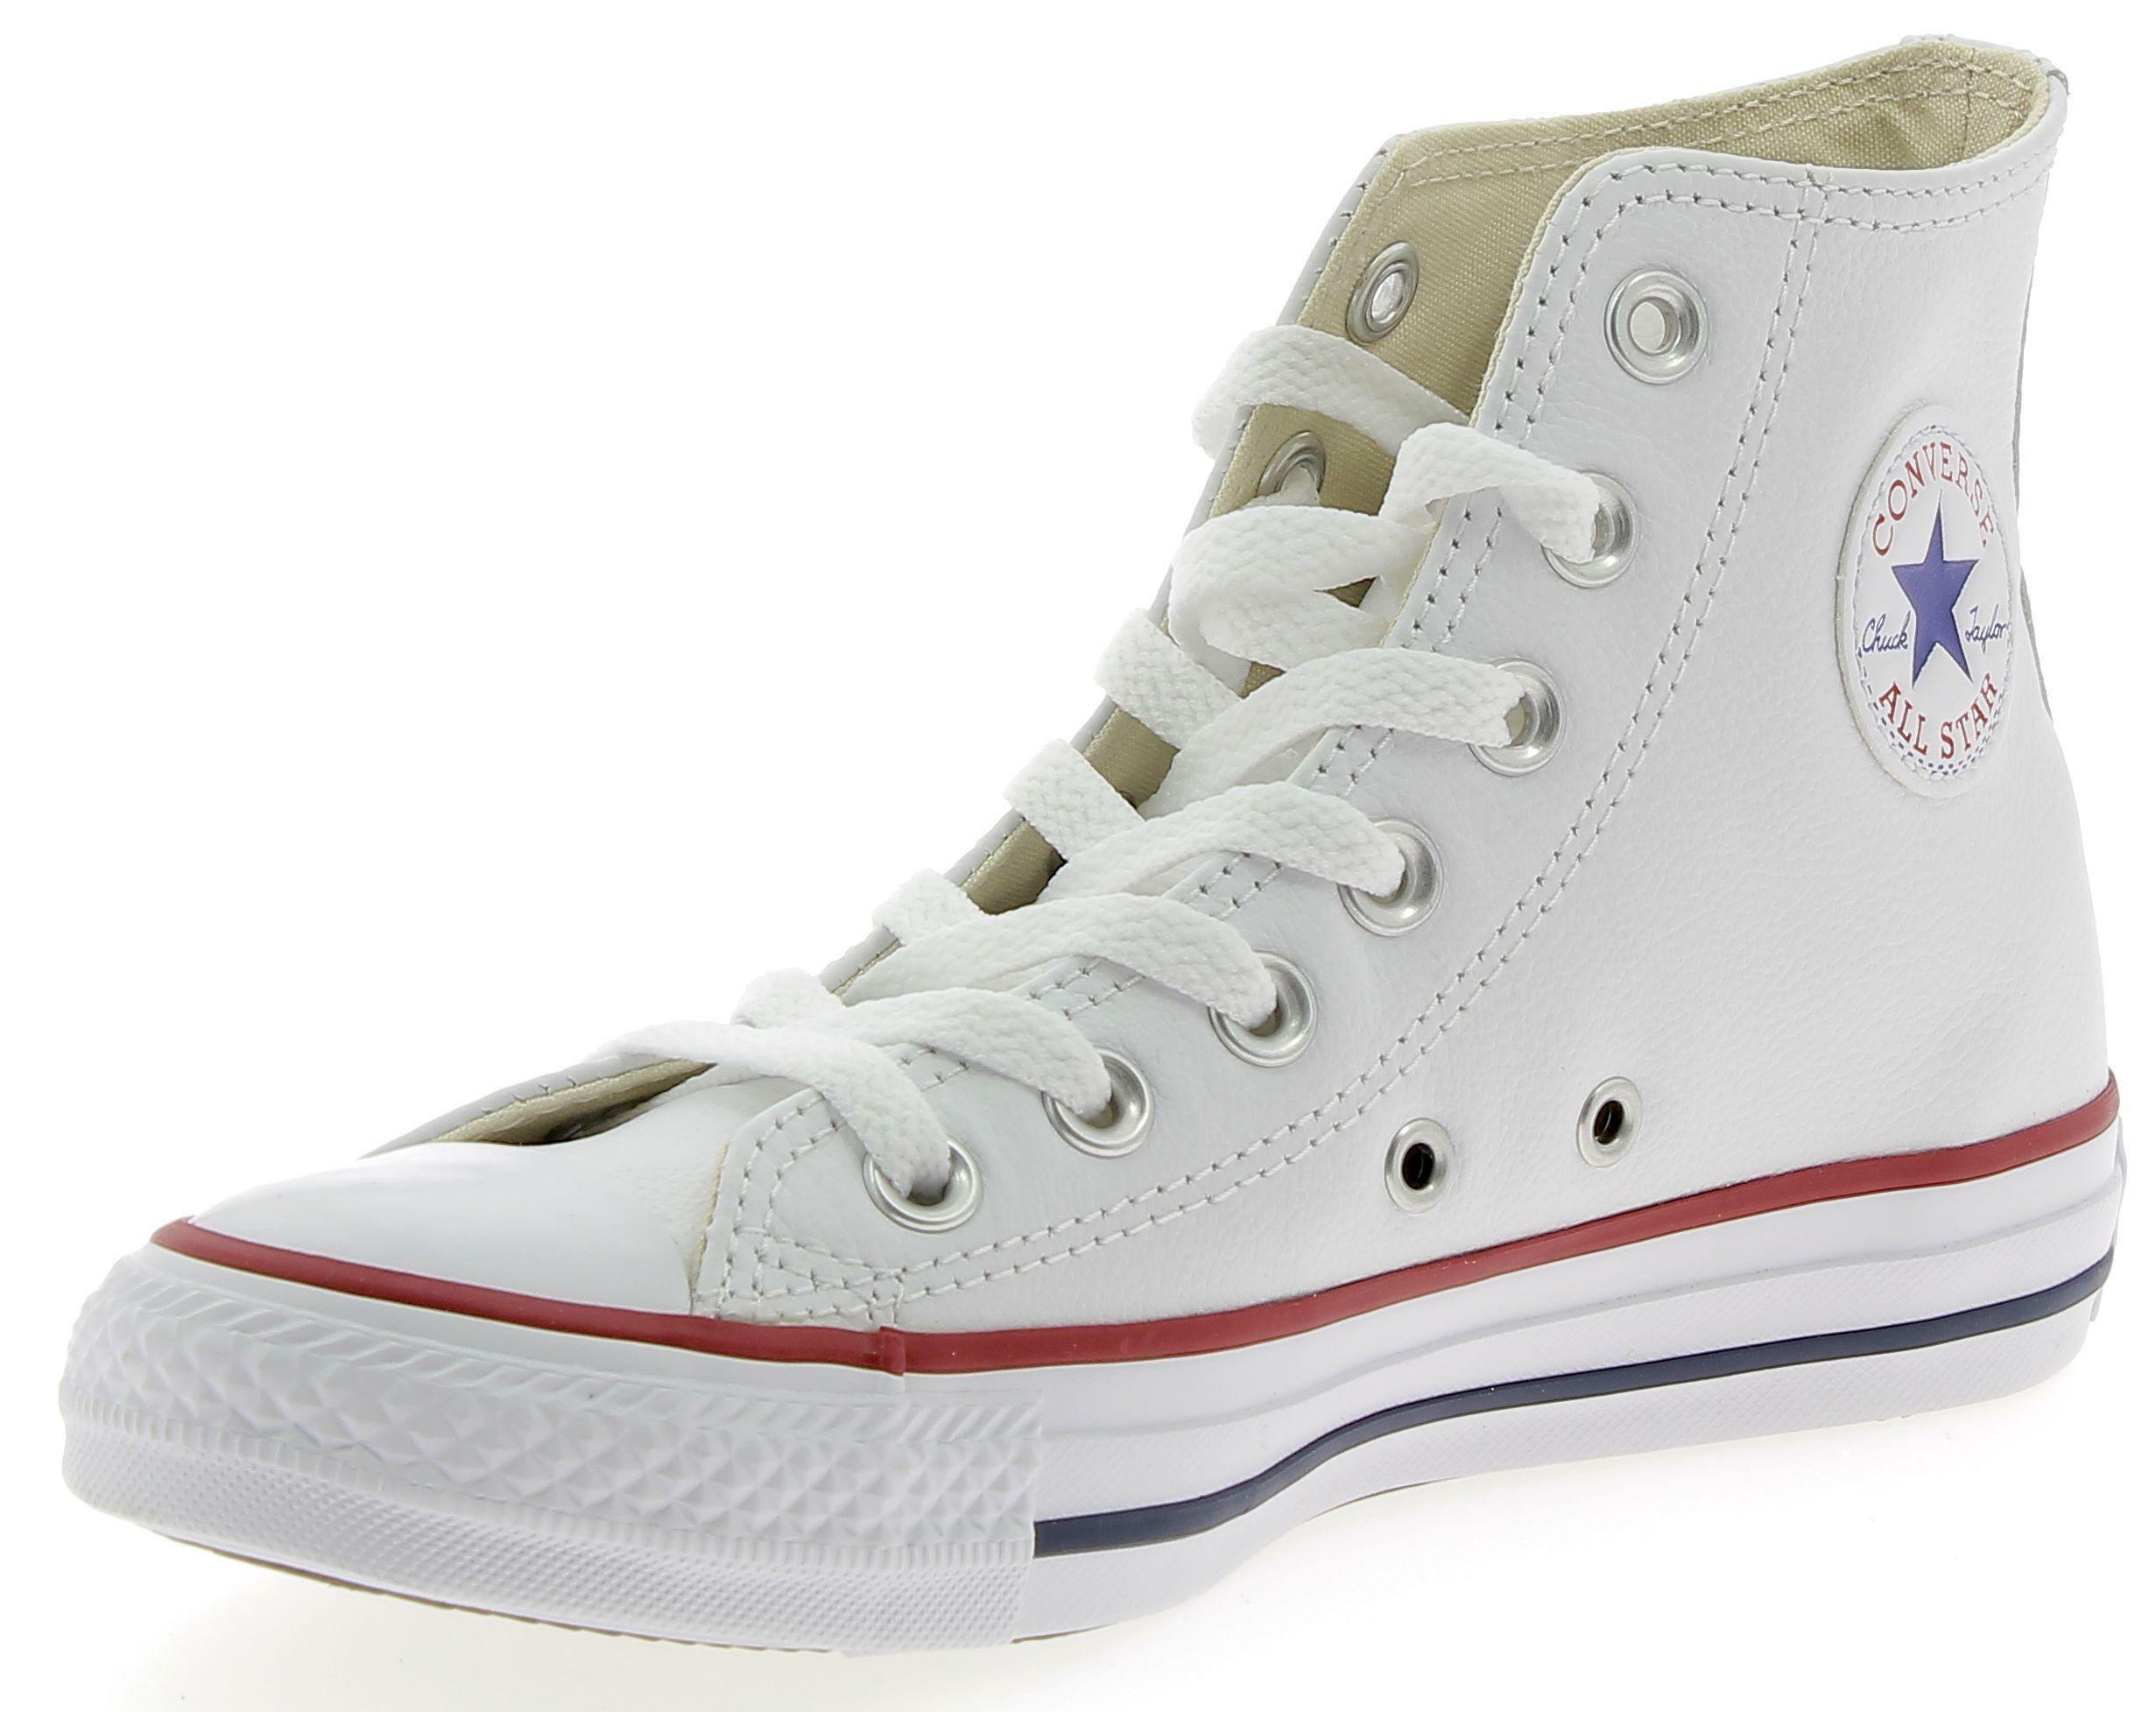 converse converse ct hl scarpe sportive pelle bianche